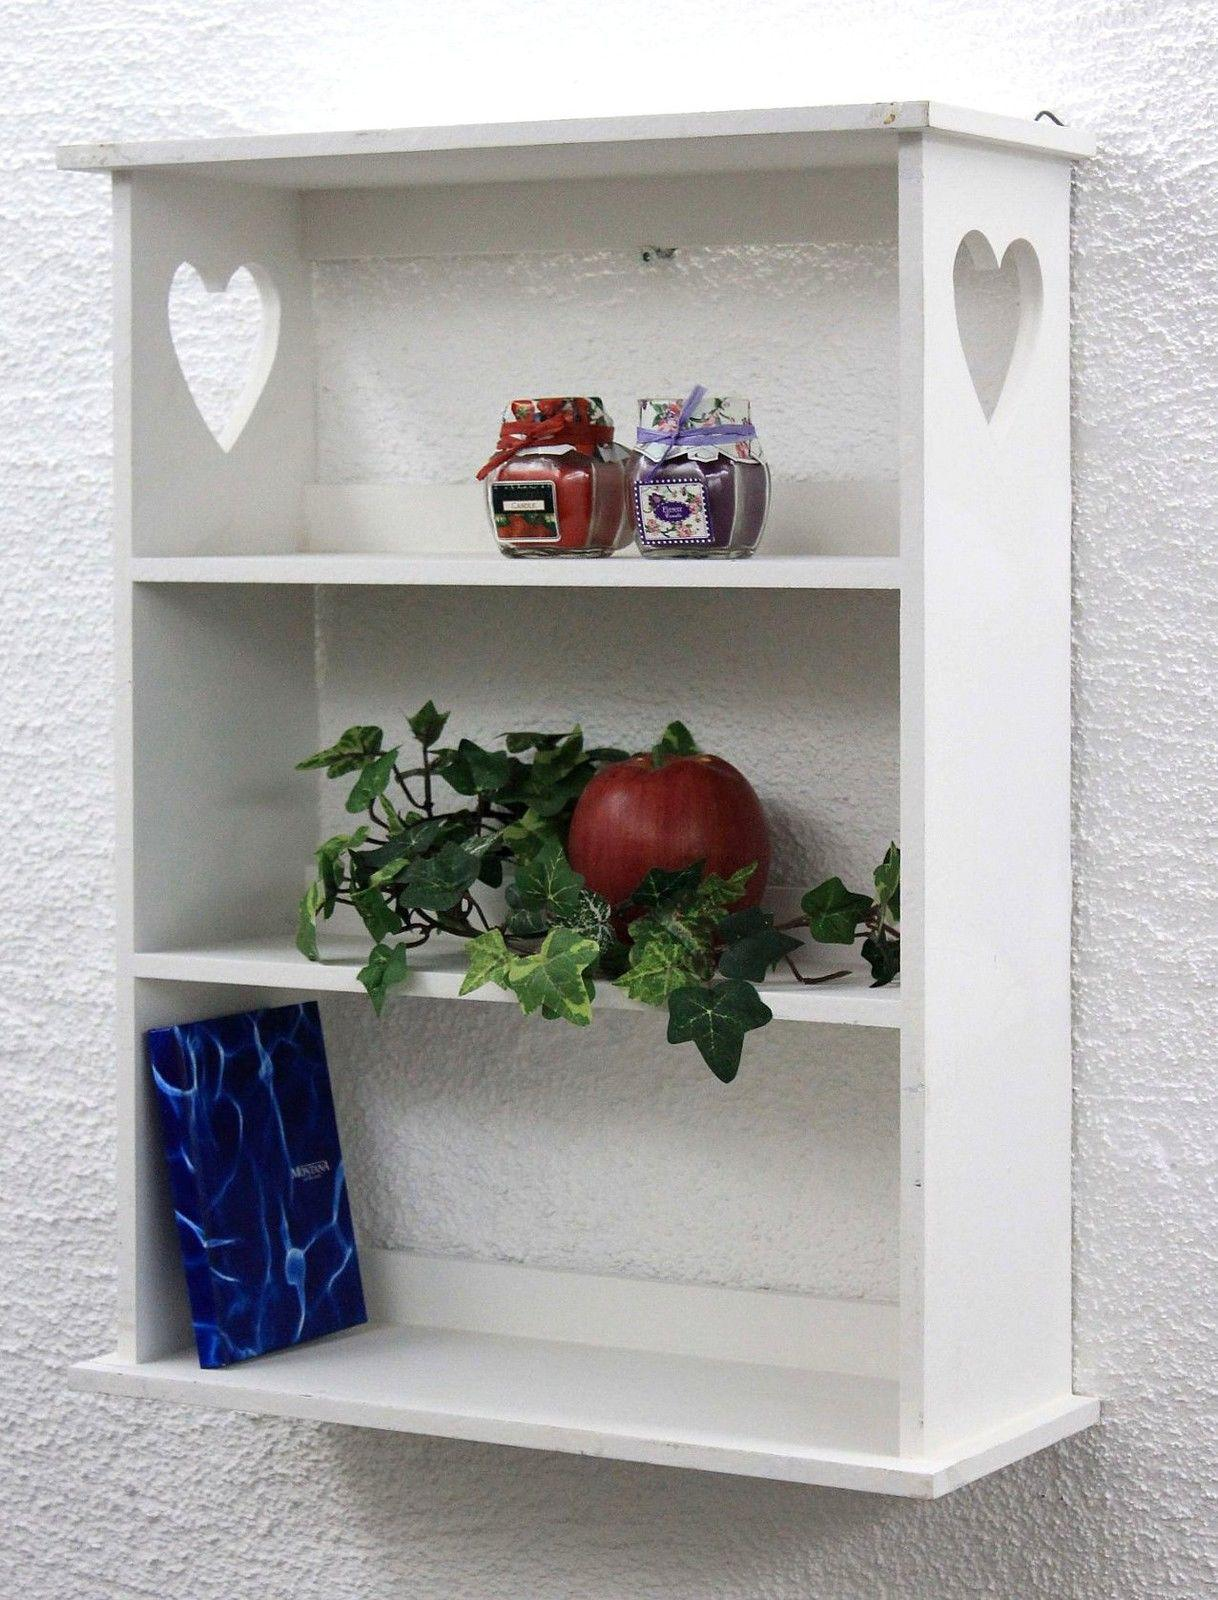 wandregal mit herz 12013 regal 50 cm vintage shabby landhaus k chenregal weiss ebay. Black Bedroom Furniture Sets. Home Design Ideas